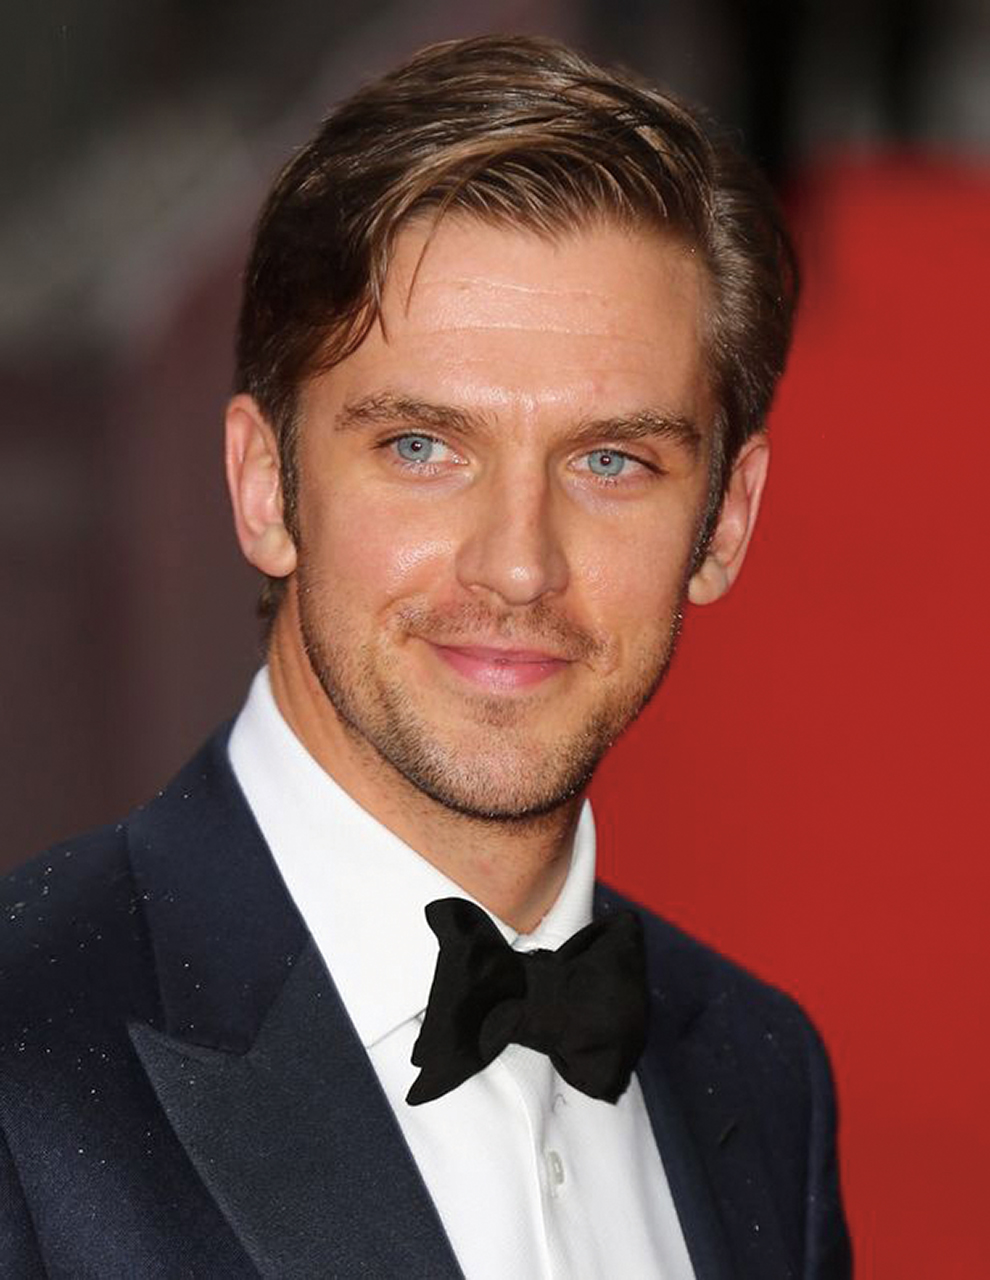 British Academy Awards 2016 at The Royal Festival Hall